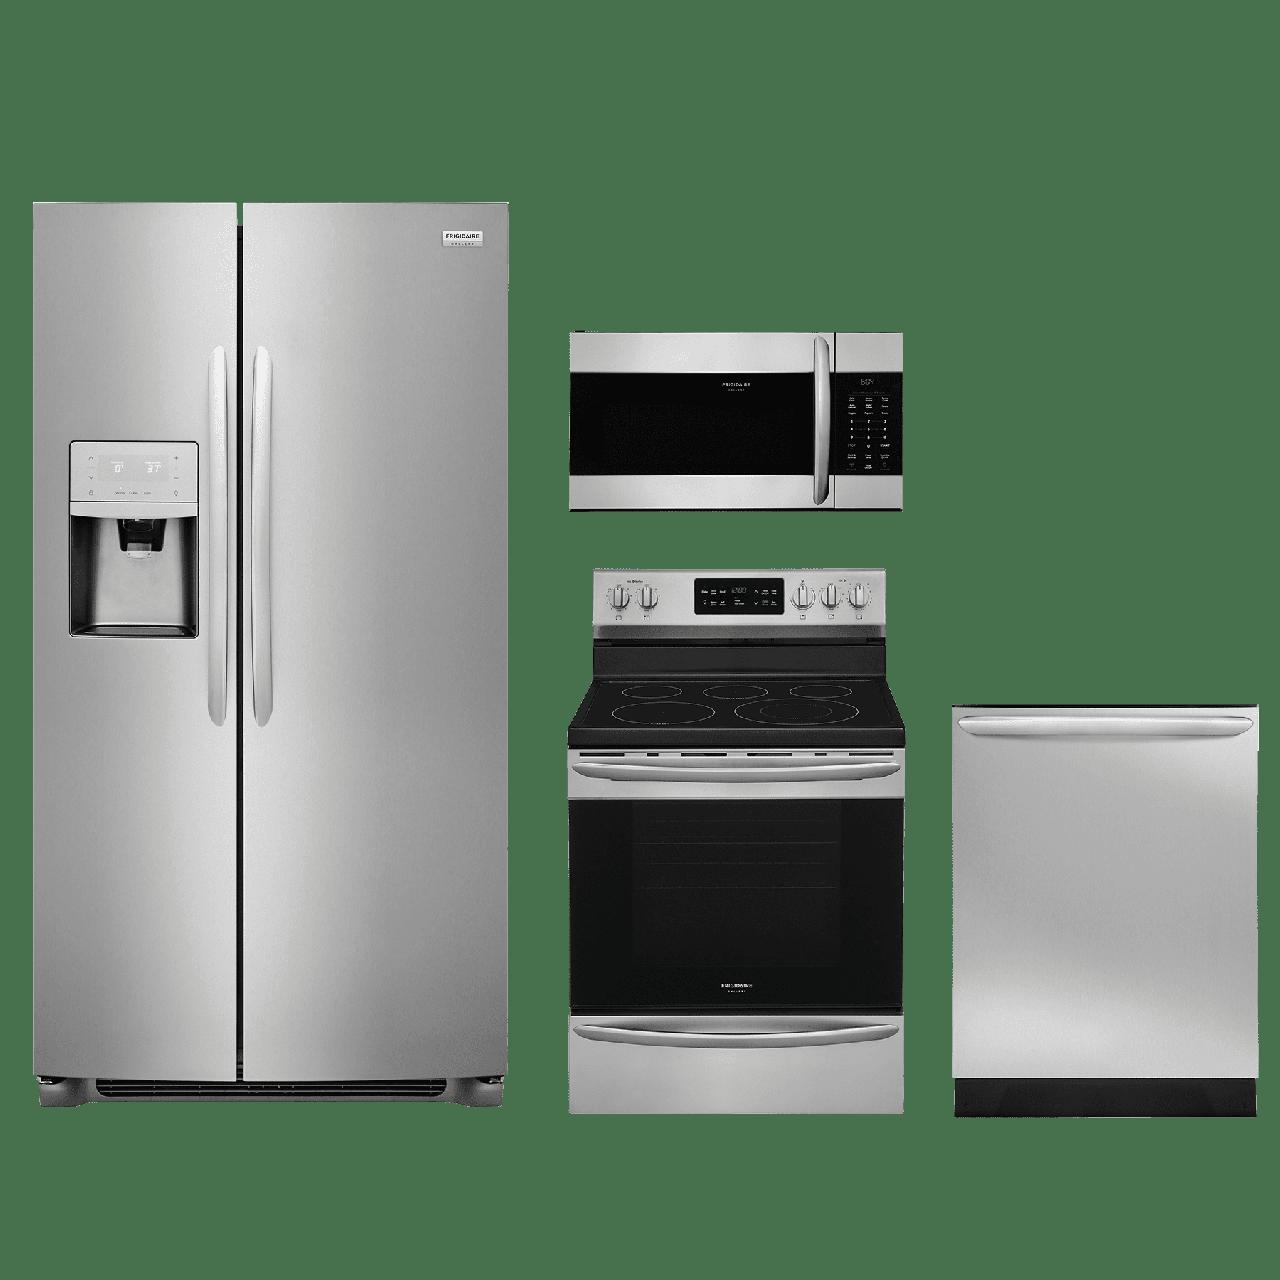 frigidaire gallery   4 piece kitchen package stainless steel  frgakitfgef3036tf kitchen appliance packages  rh   bakerbrosfurnitureandappliance com